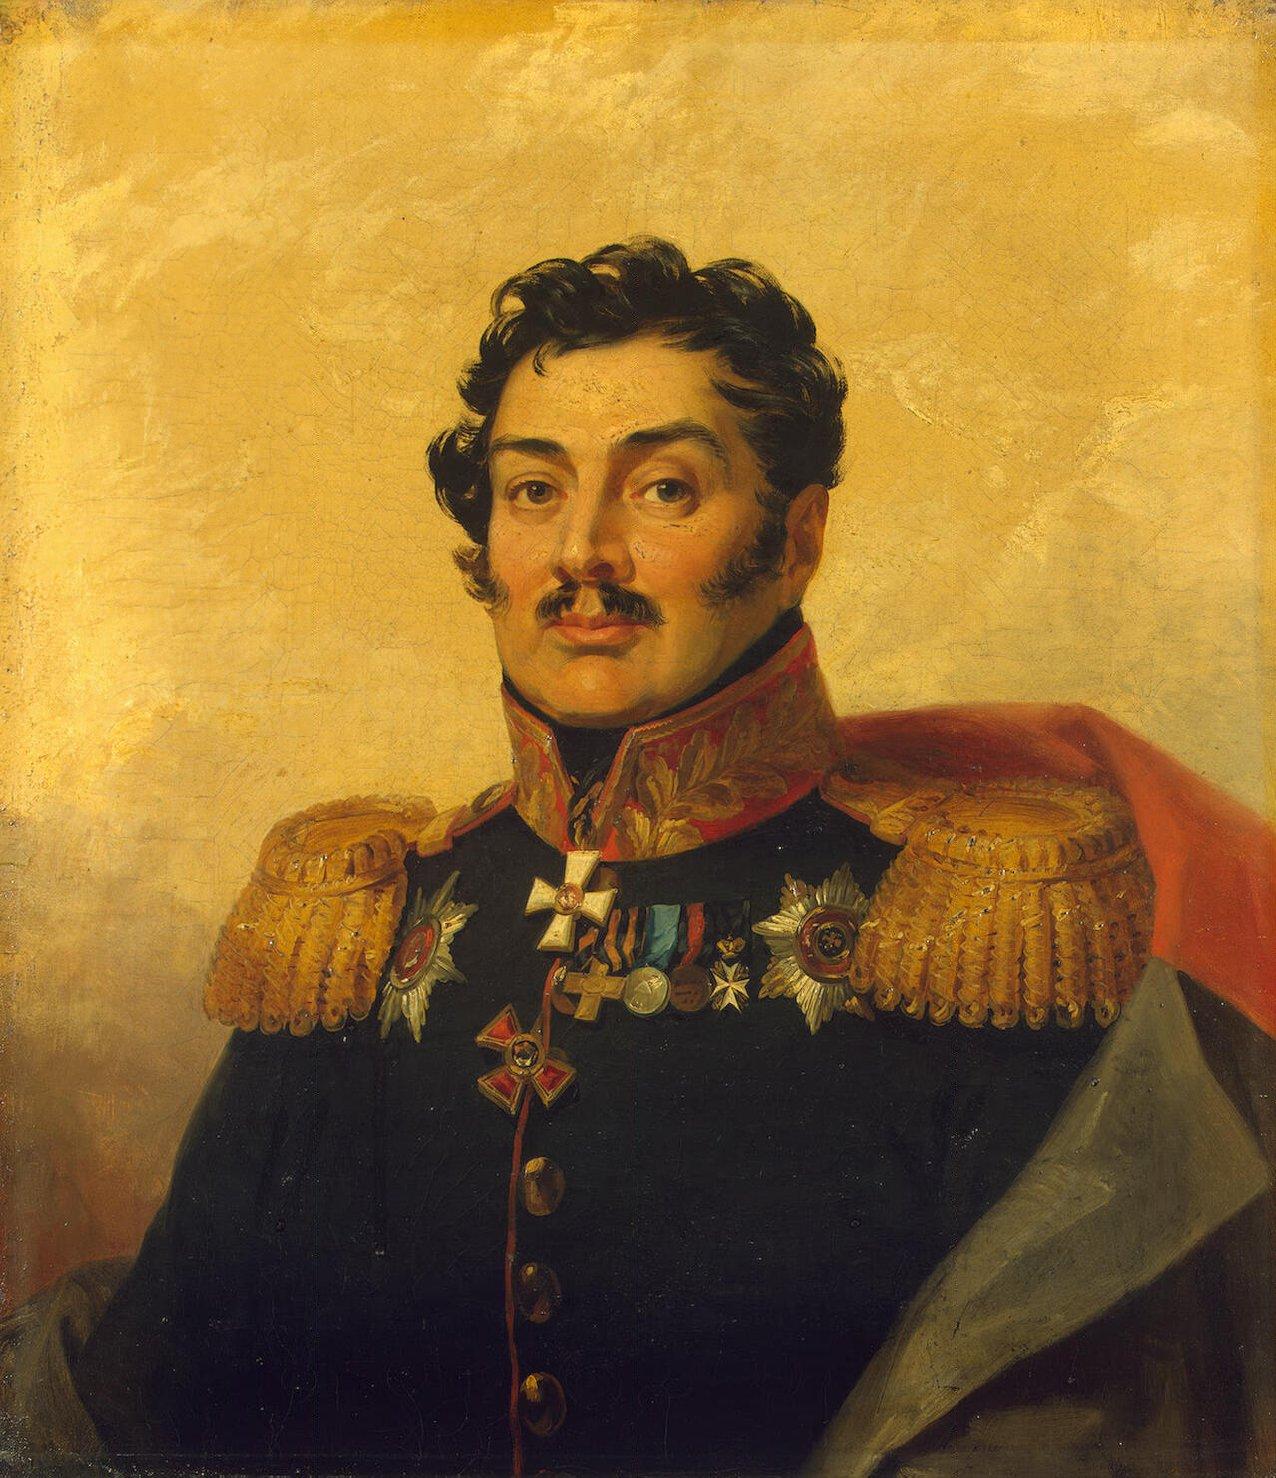 Шепелев, Дмитрий Дмитриевич